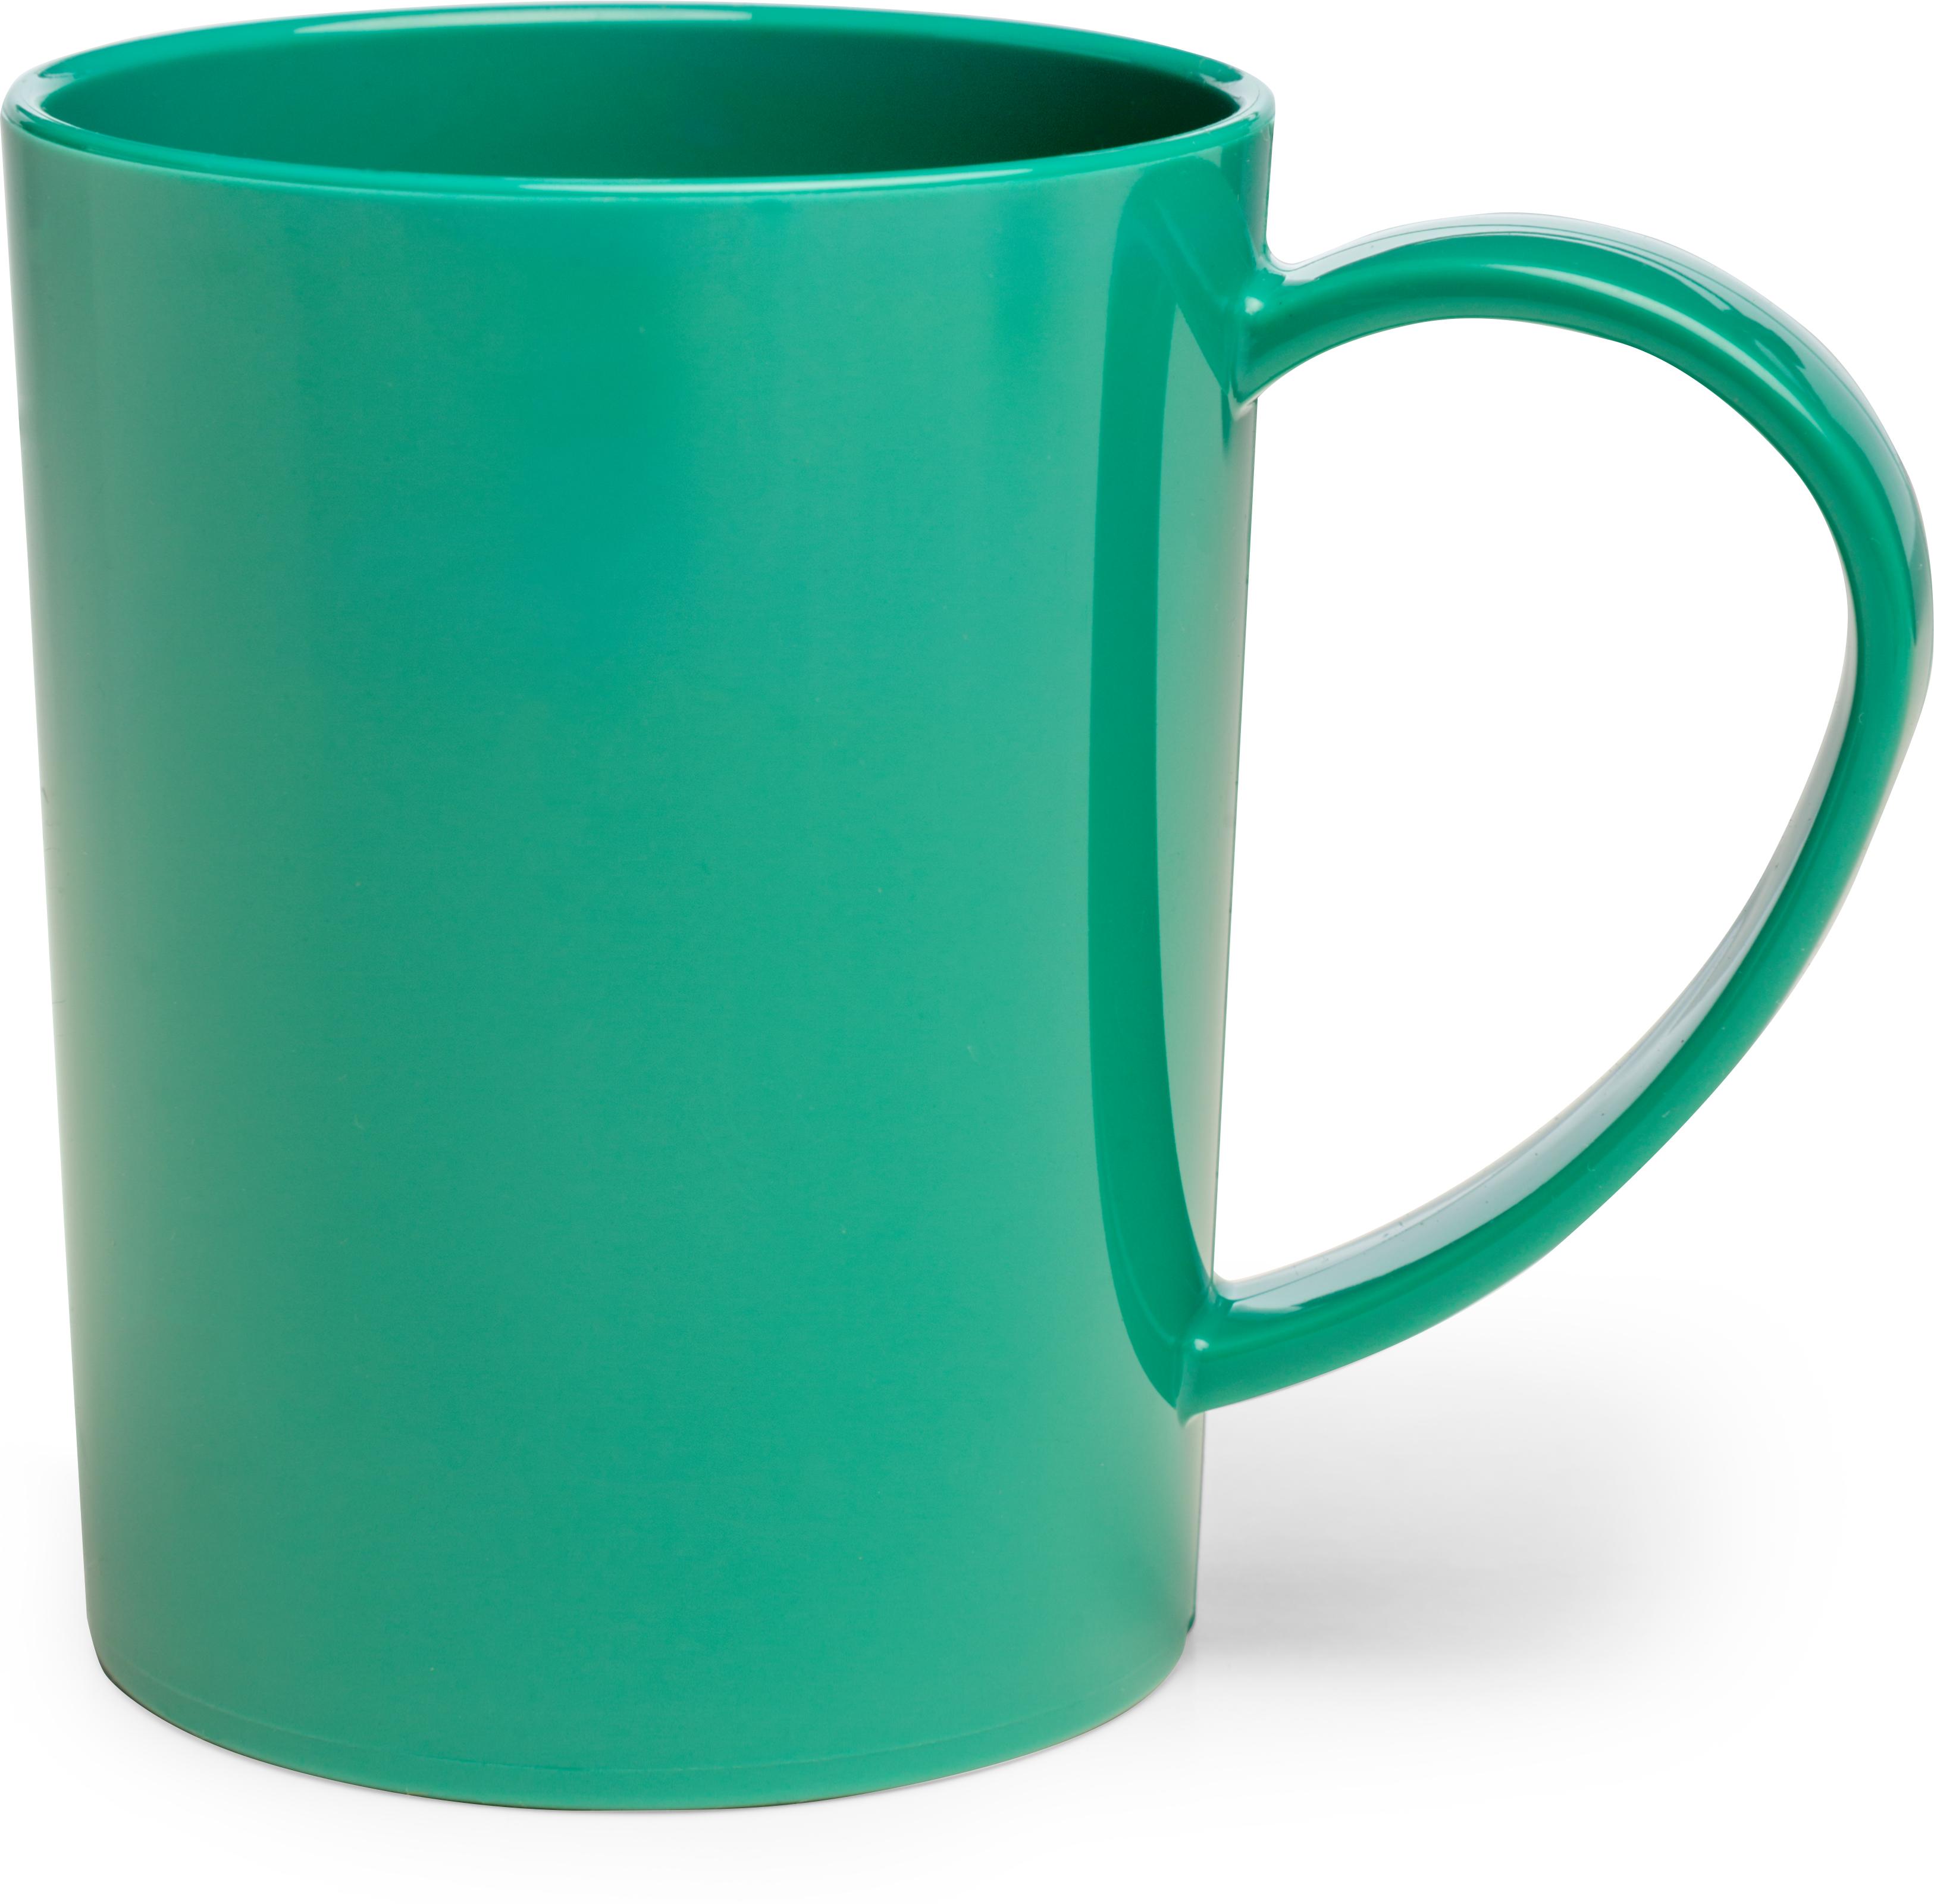 Carlisle Mug 8 oz - Meadow Green